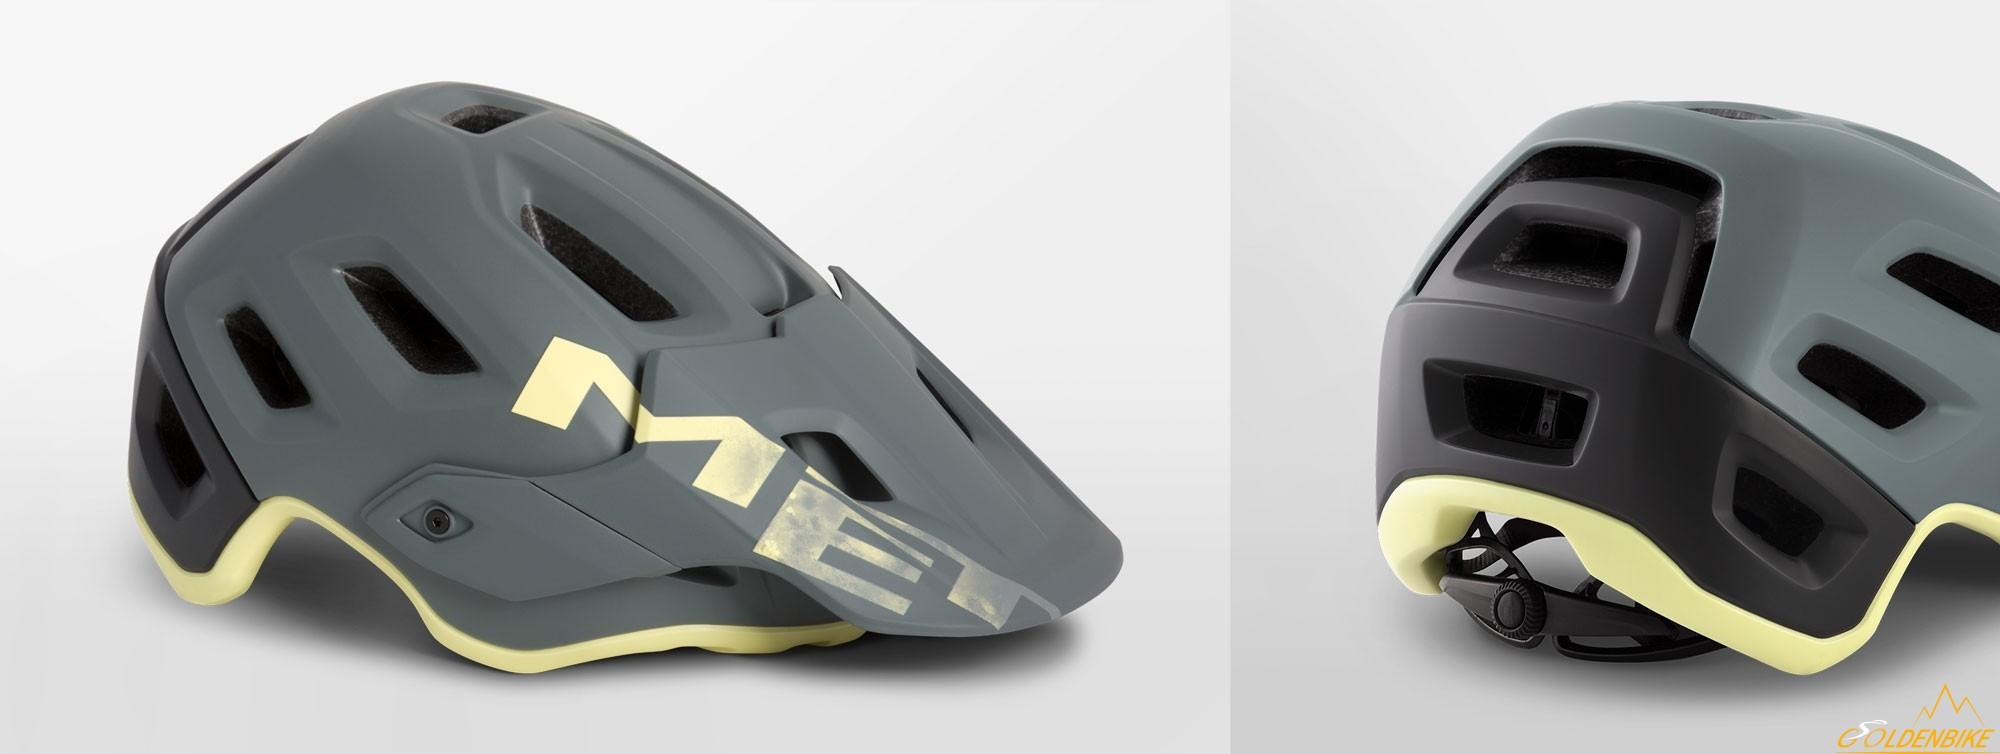 Шлем MET Roam Gray Tender Yellow Matt 0